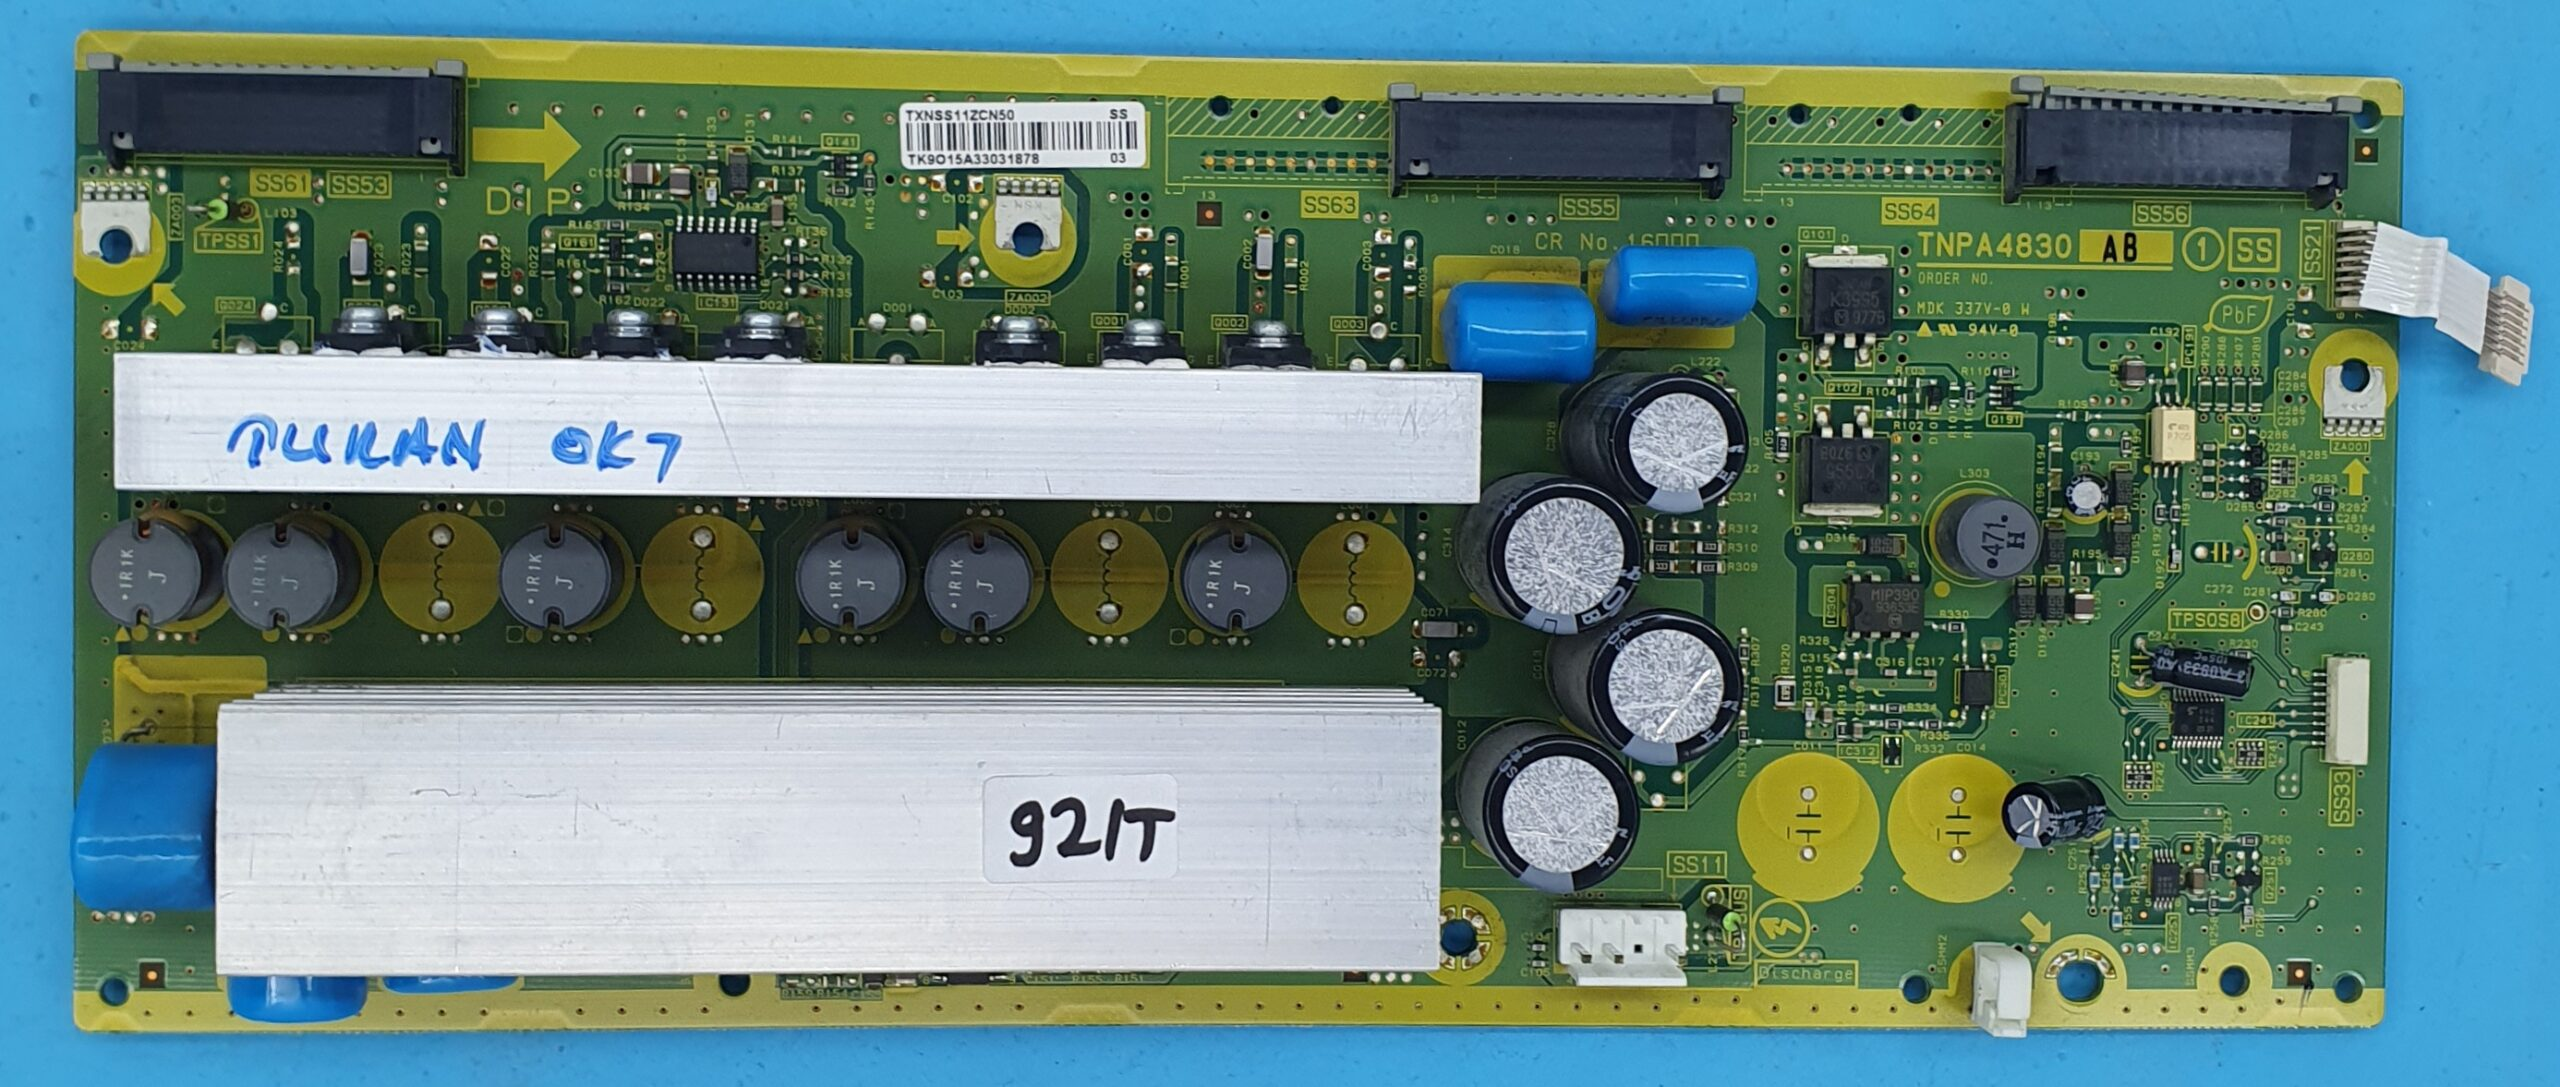 TNPA4830 PANASONIC Z-SUS (KDV DAHİL = 150 TL)